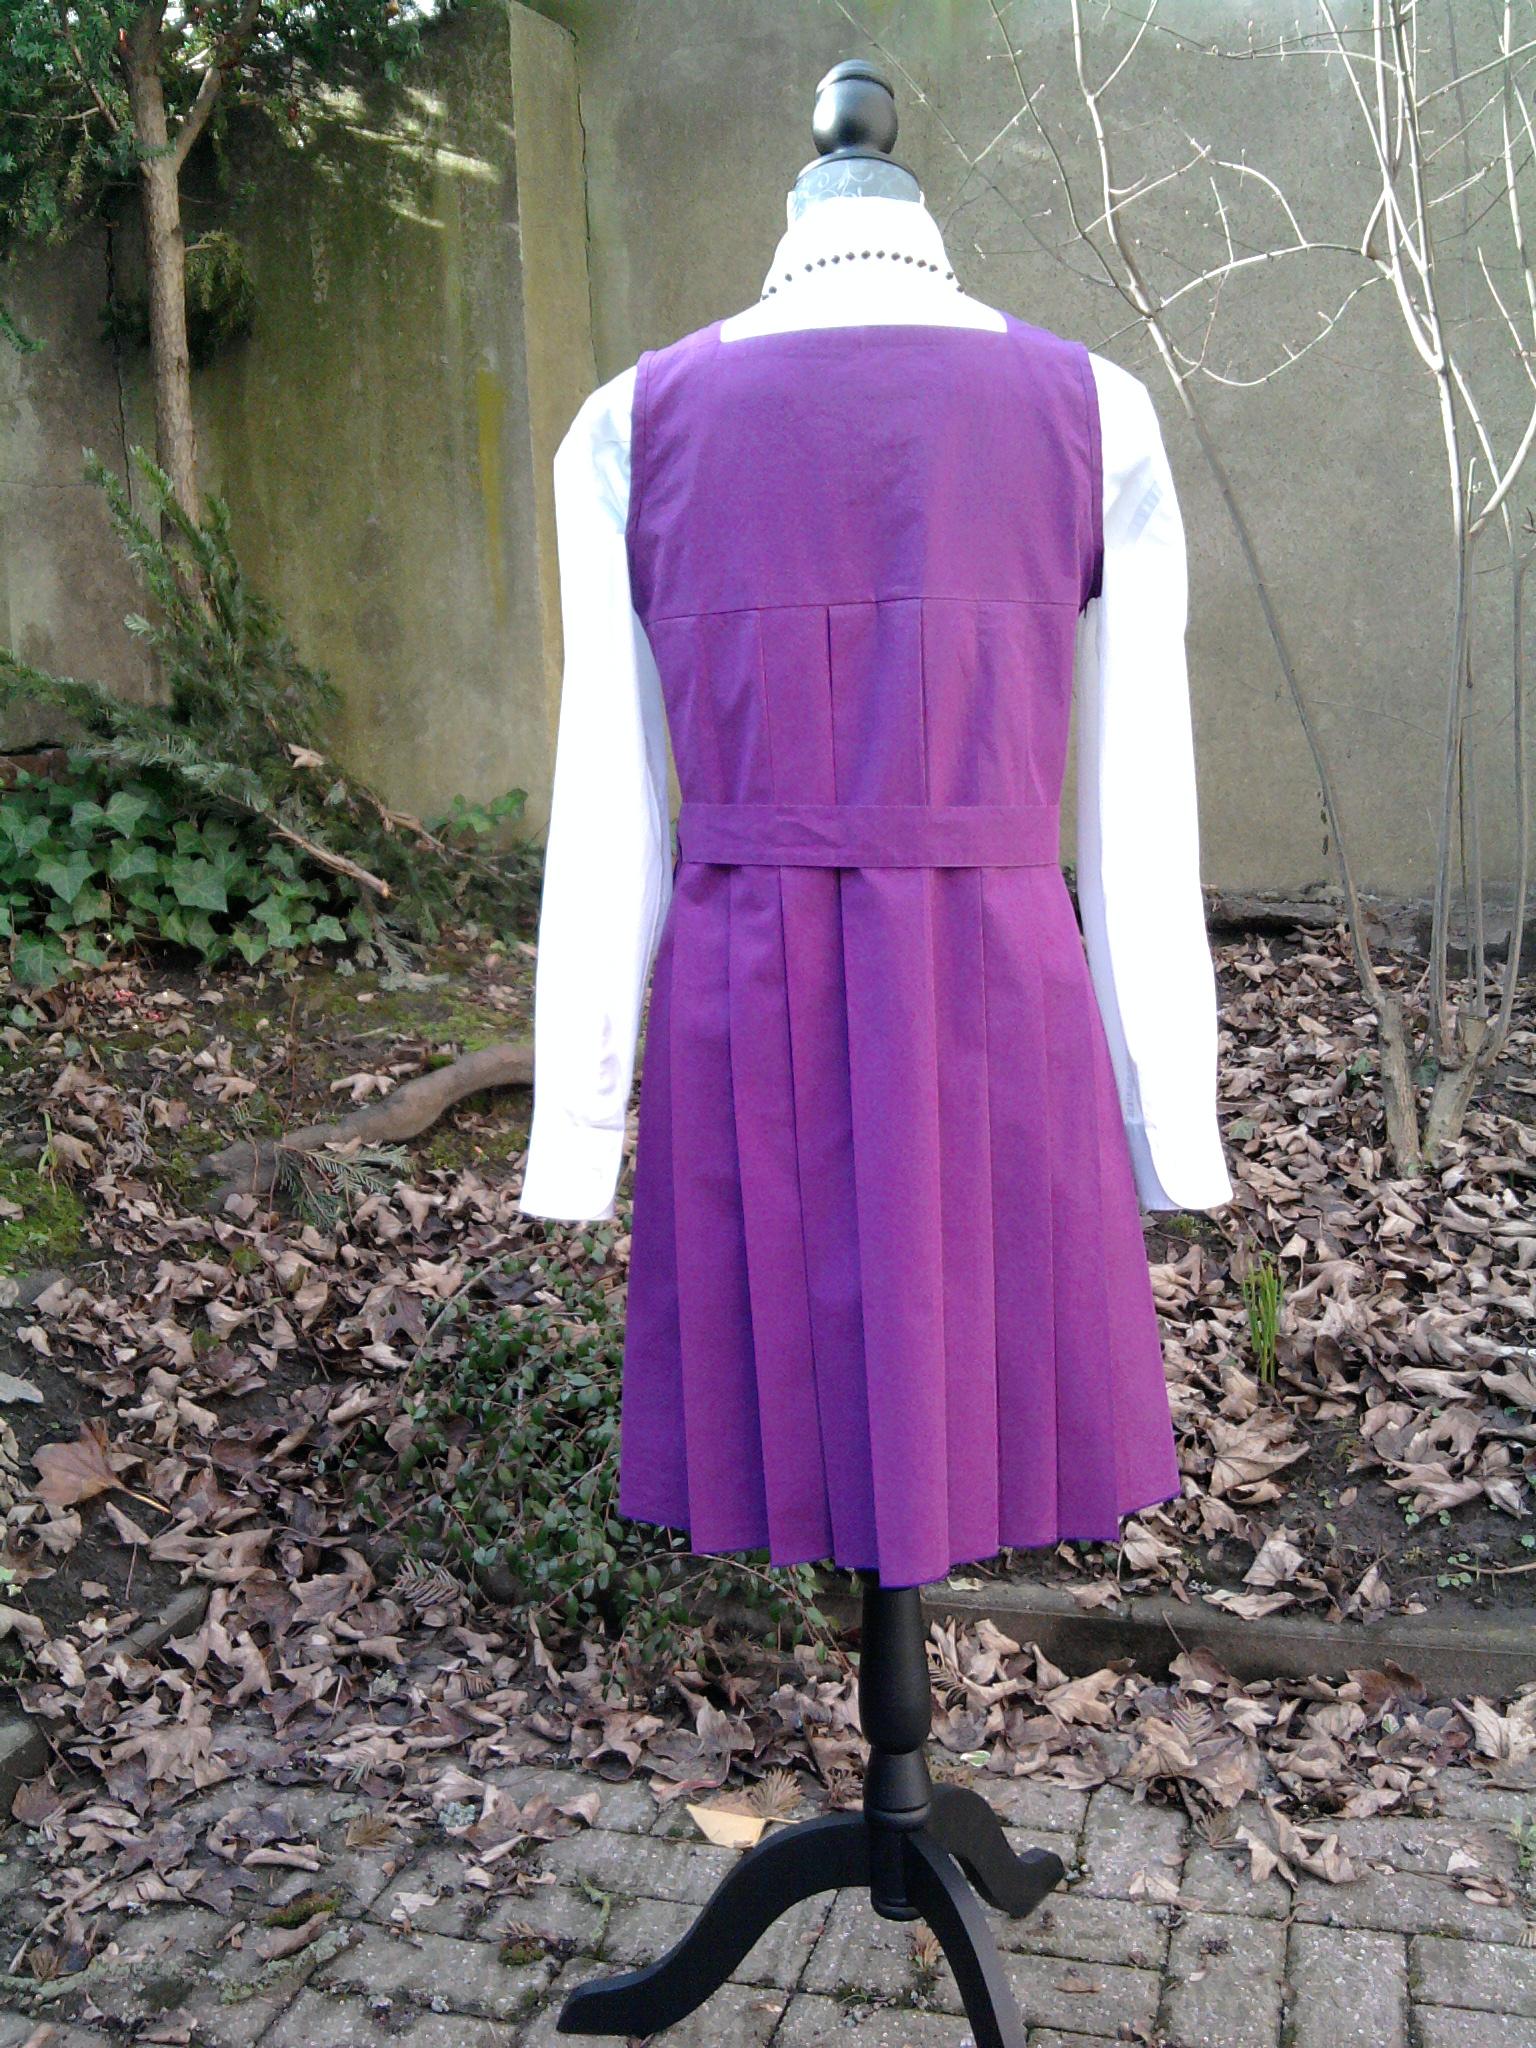 Schulmädchenuniform, Rückenansicht